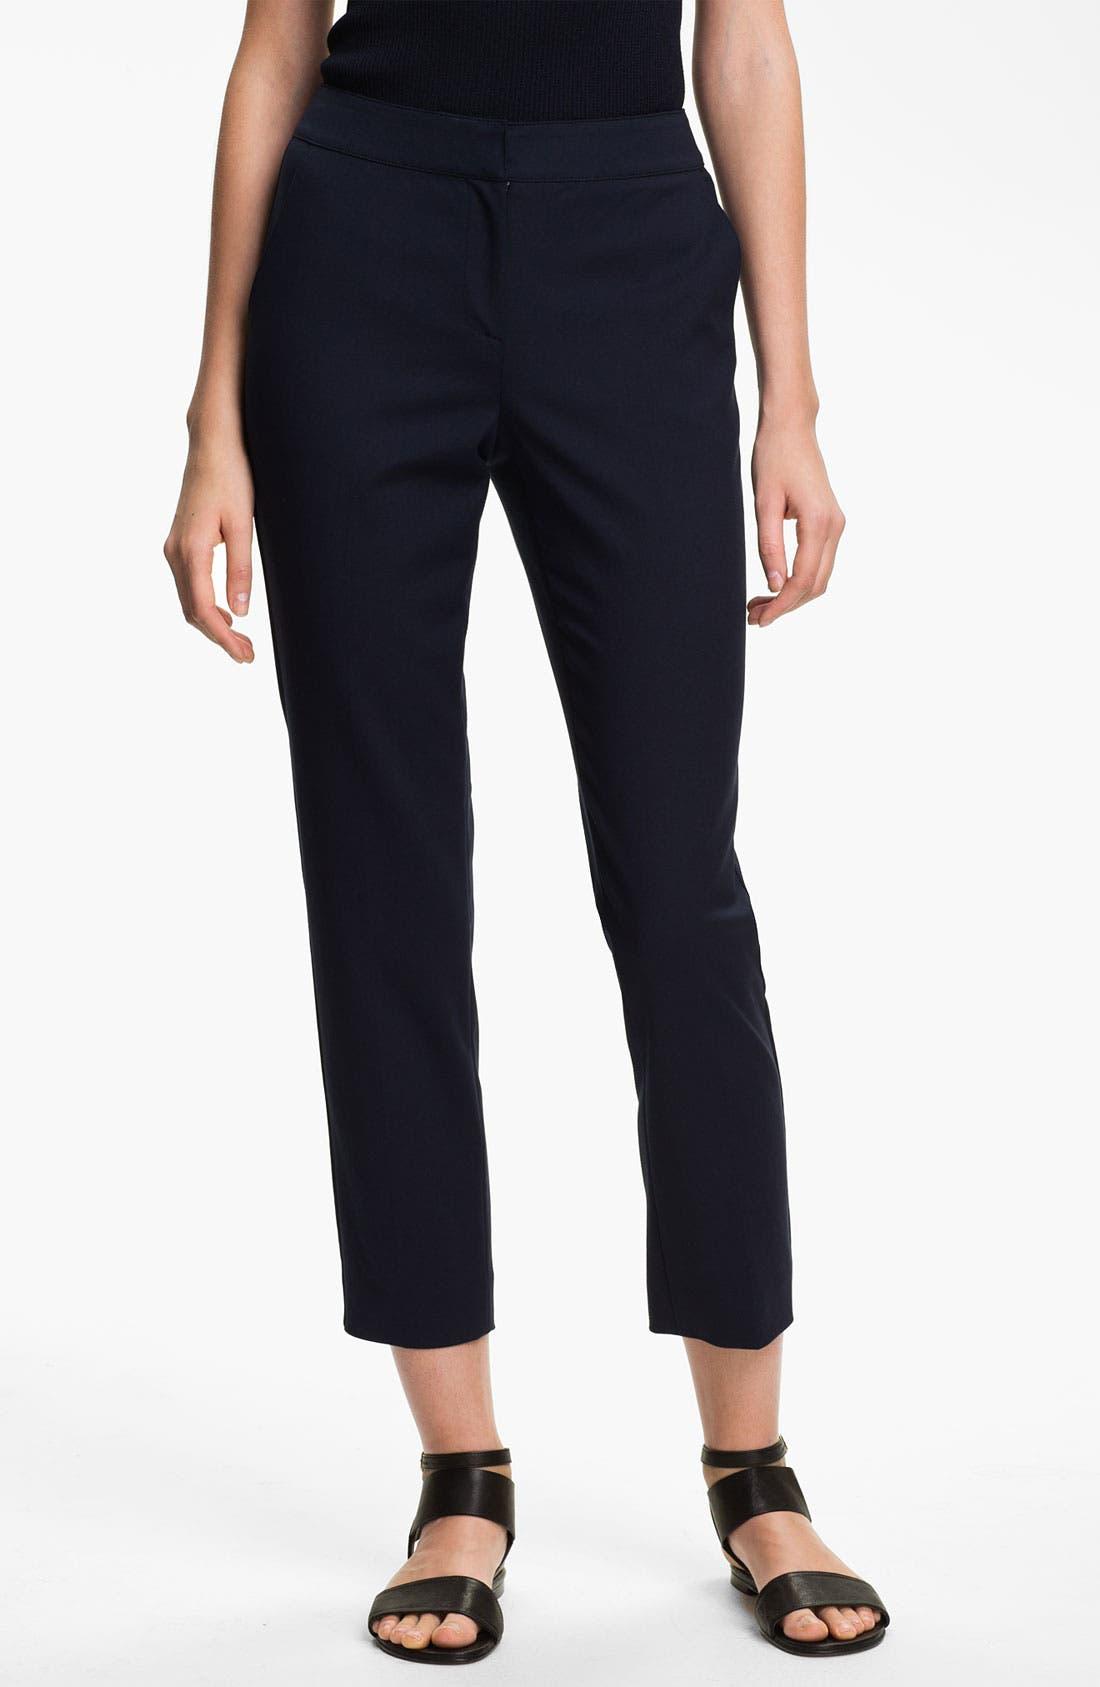 Main Image - St. John Collection 'Emma' Double Weave Stretch Cotton Crop Pants